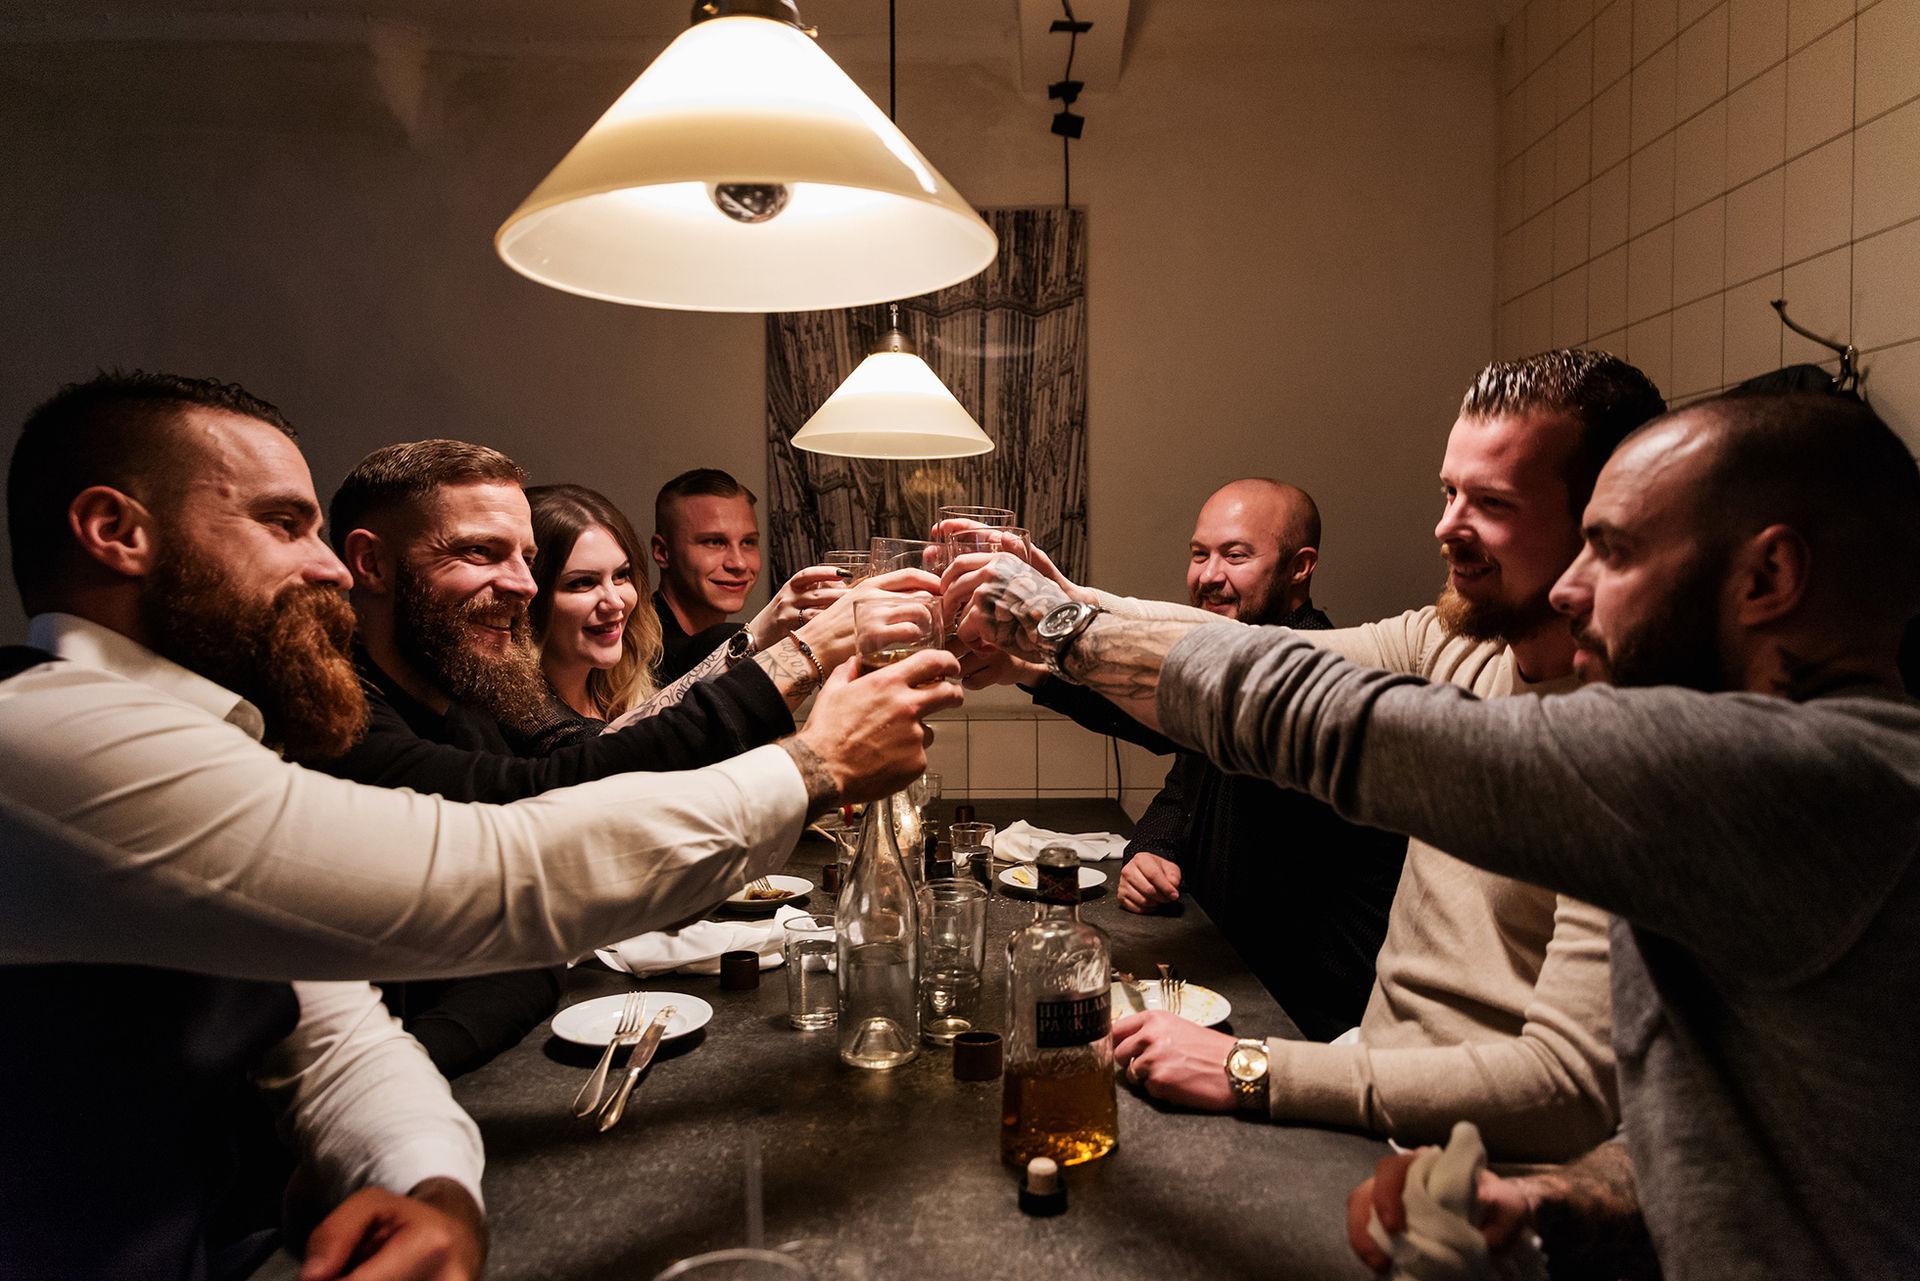 Salong Betong-Danne frontar whiskykampanj